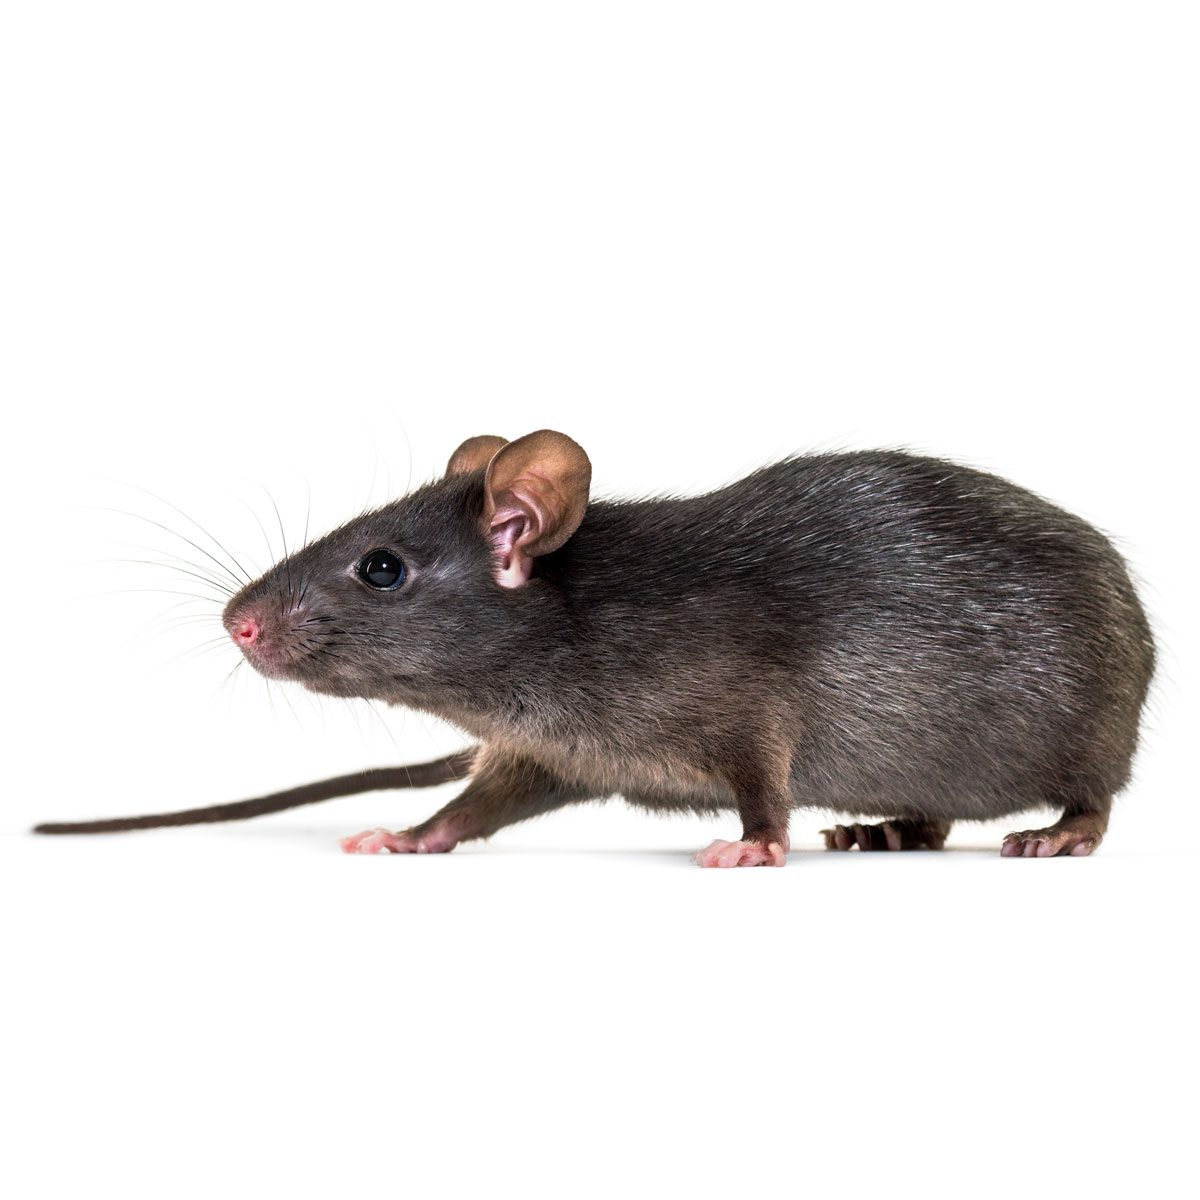 Black rat (roof rat)